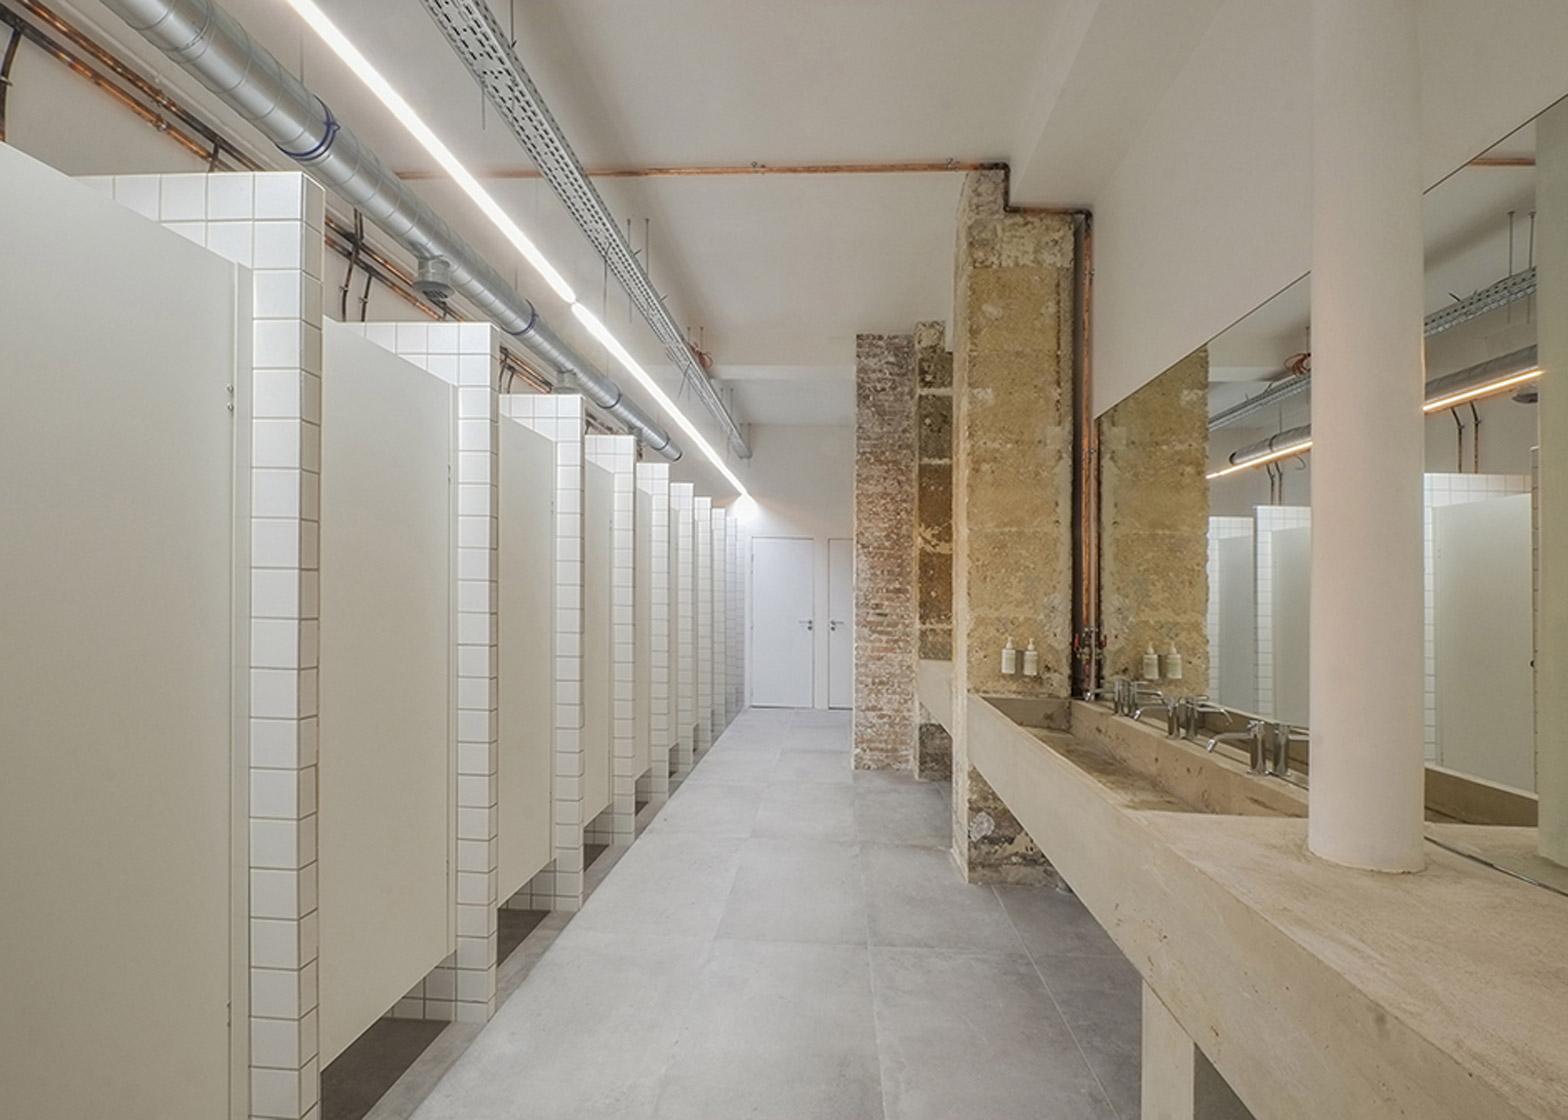 Architecture-paris-sport-club-design-studia-interiors-osnovadesign-osnova-poltava-10